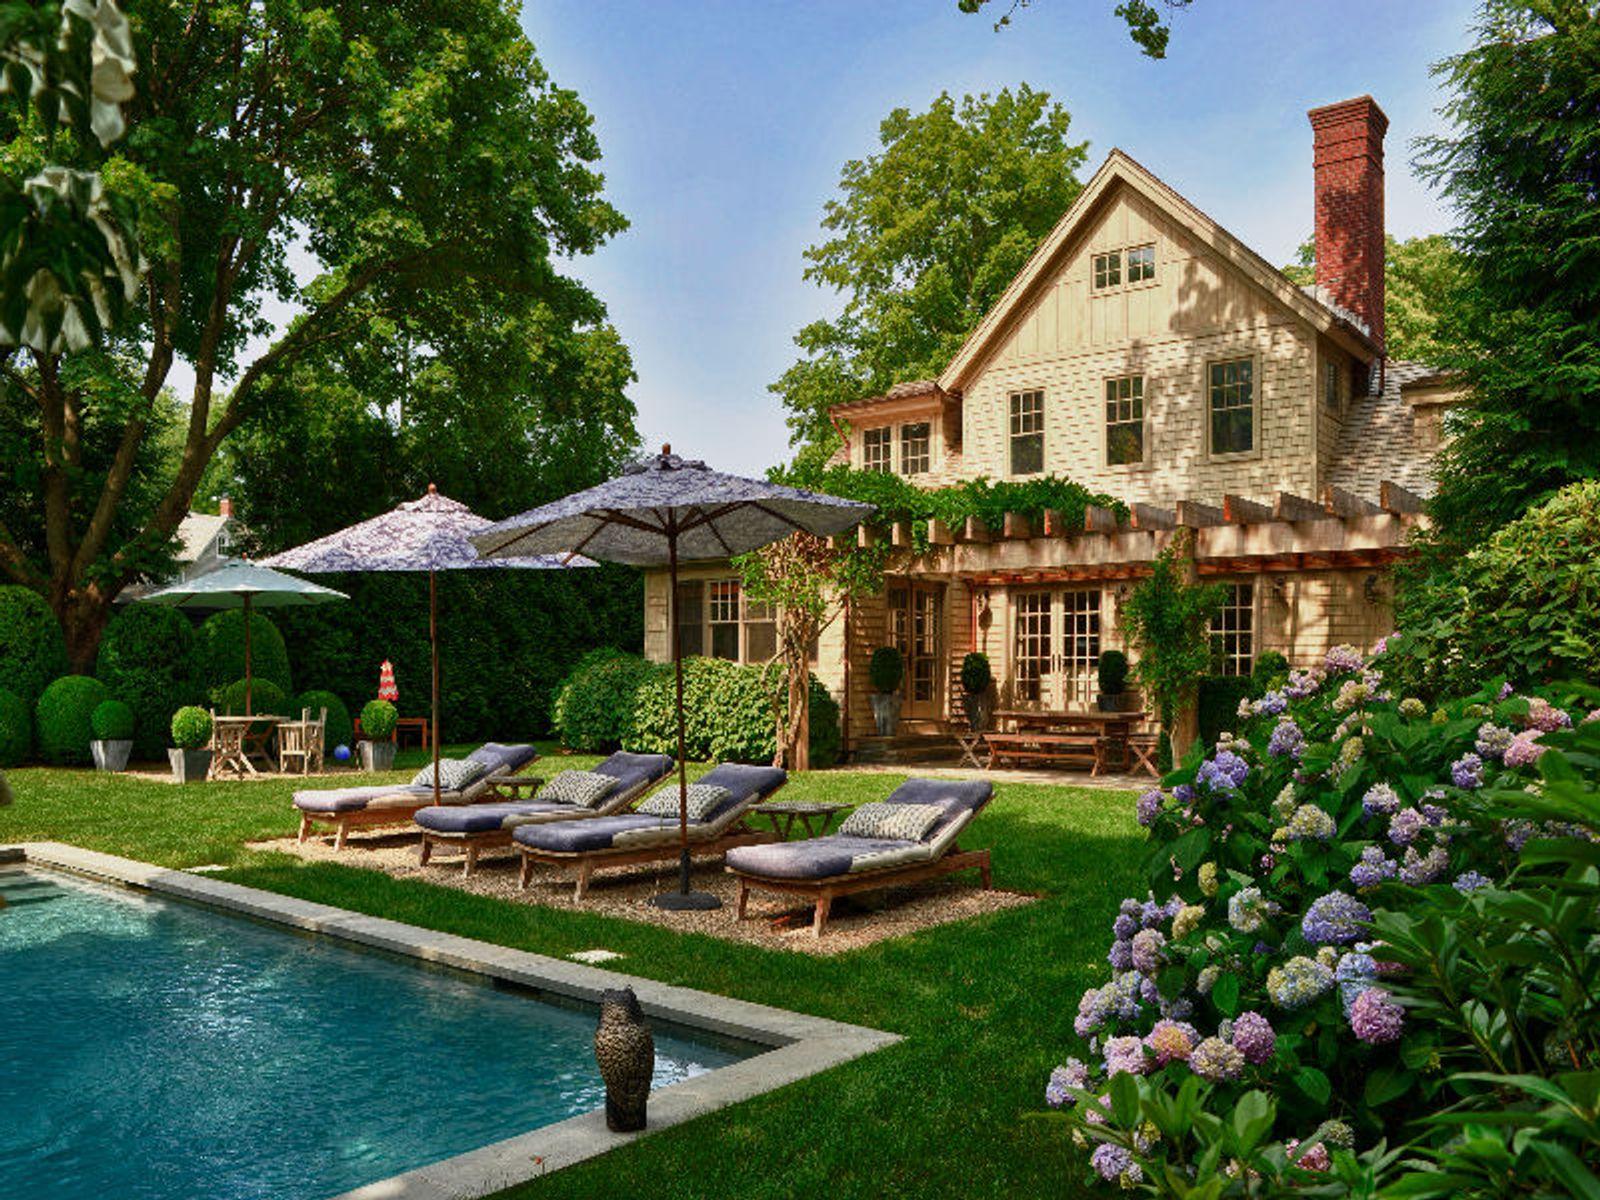 Sag harbor village jewel sag harbor ny single family for Hamptons home for sale